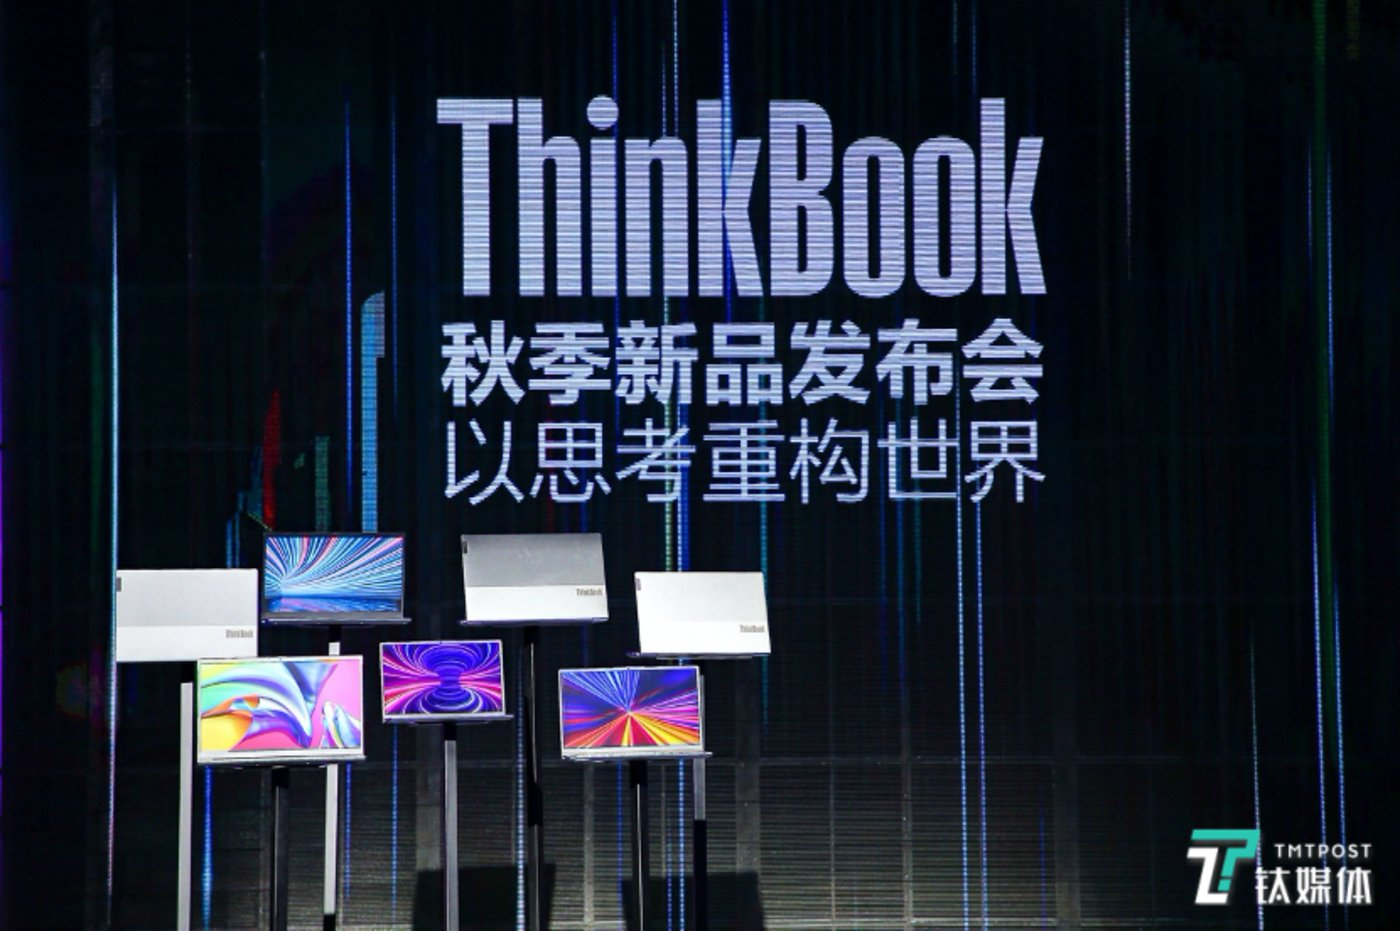 ThinkBook全系新品